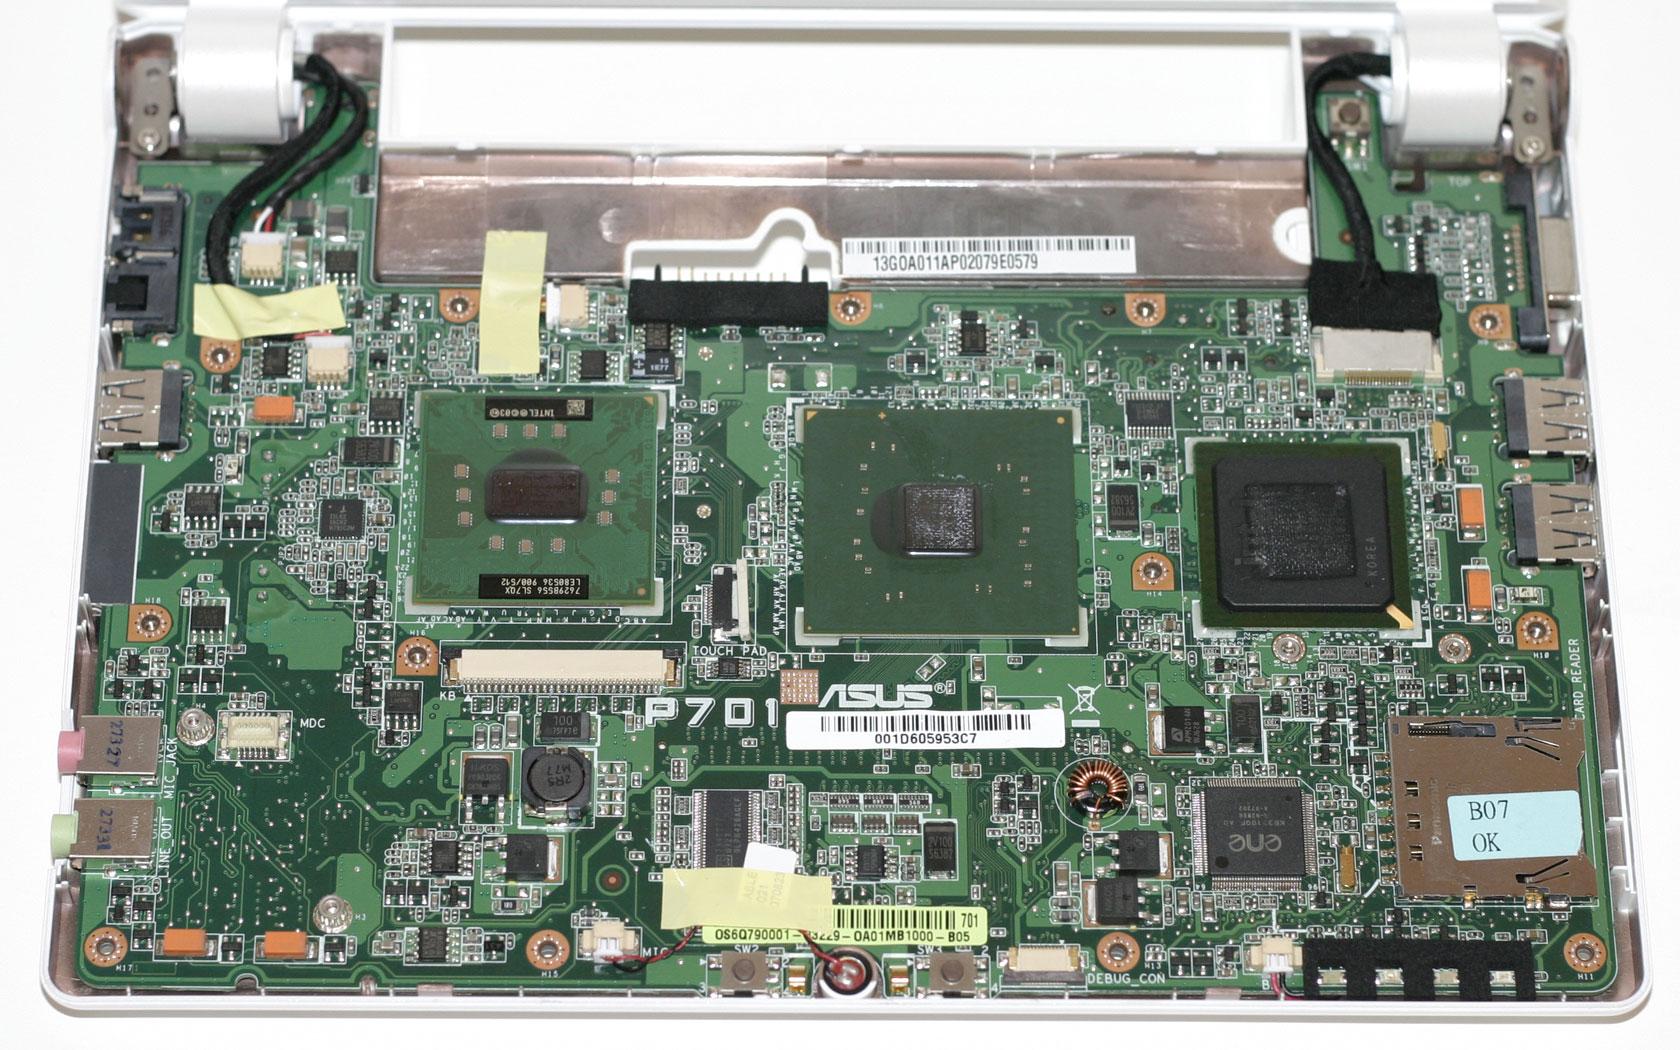 ASUS Eee PC 4G/XP (Eee PC 4G - X) drivers